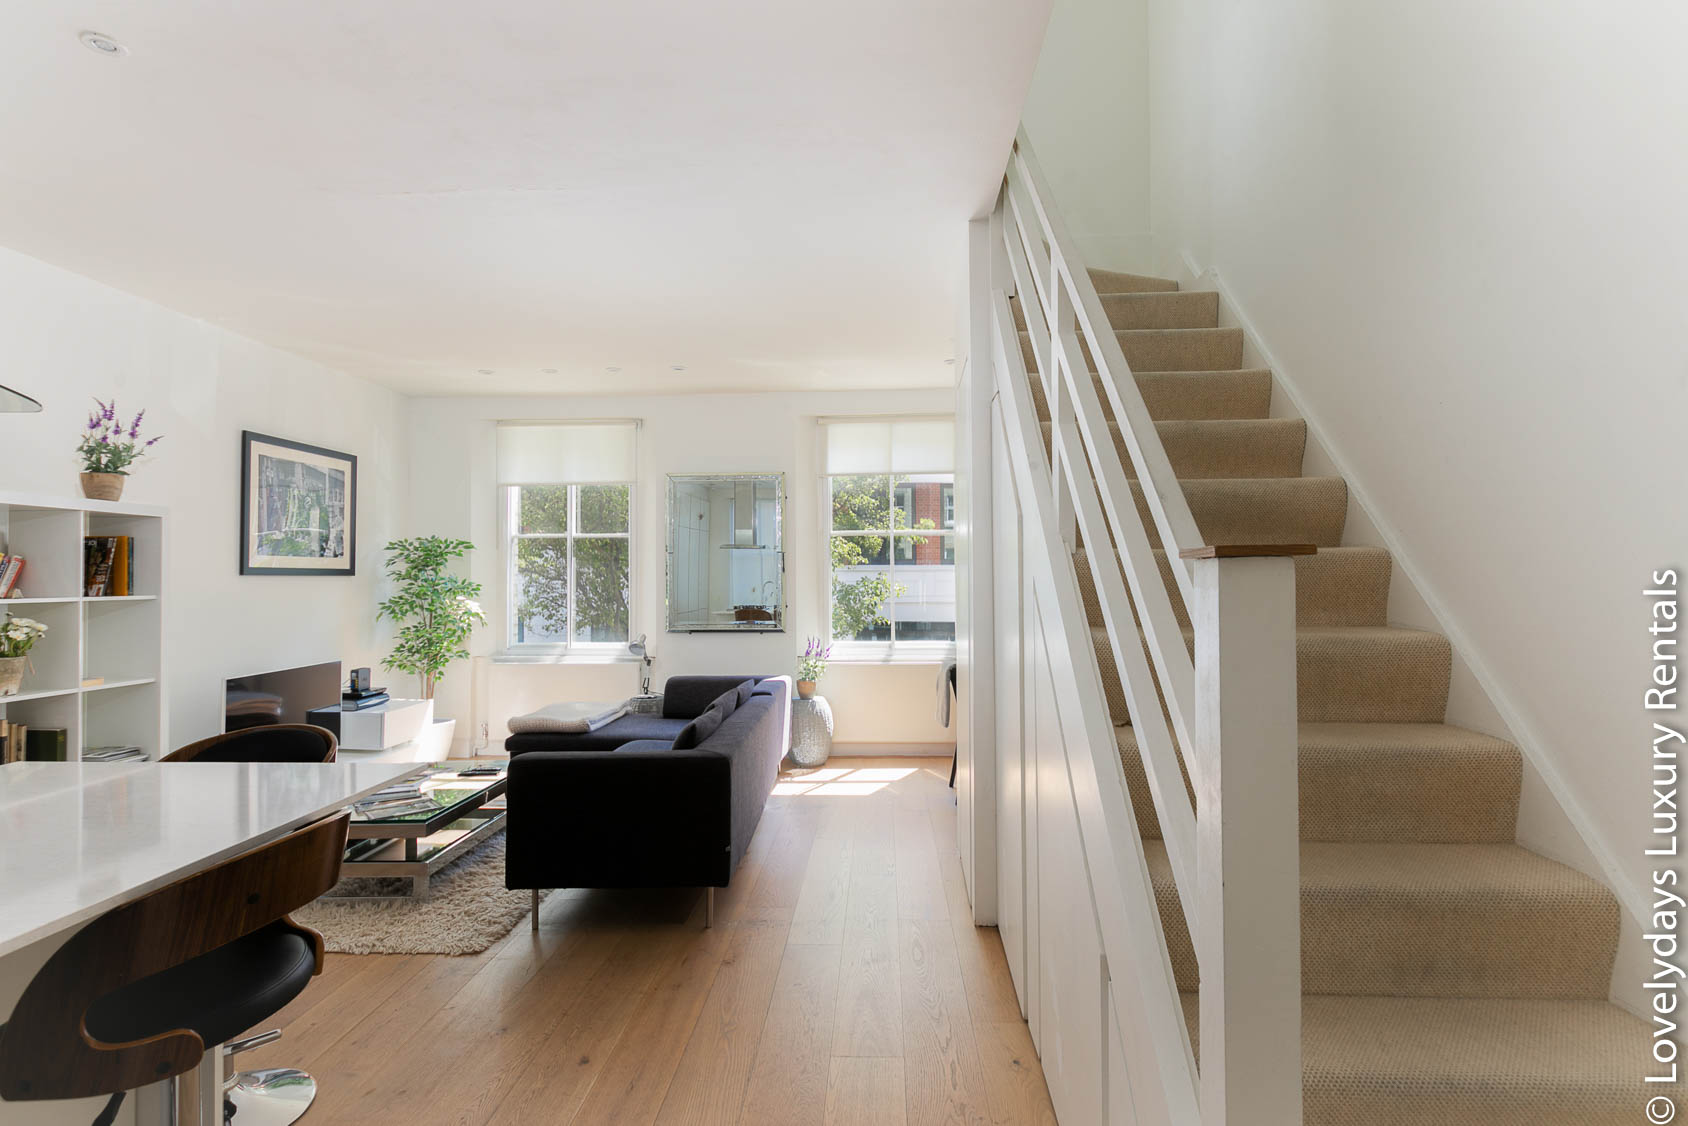 Lovelydays luxury service apartment rental - London - Fitzrovia - Foley Street - Lovelysuite - 2 bedrooms - 2 bathrooms - Double living room - f14922f7699f - Lovelydays